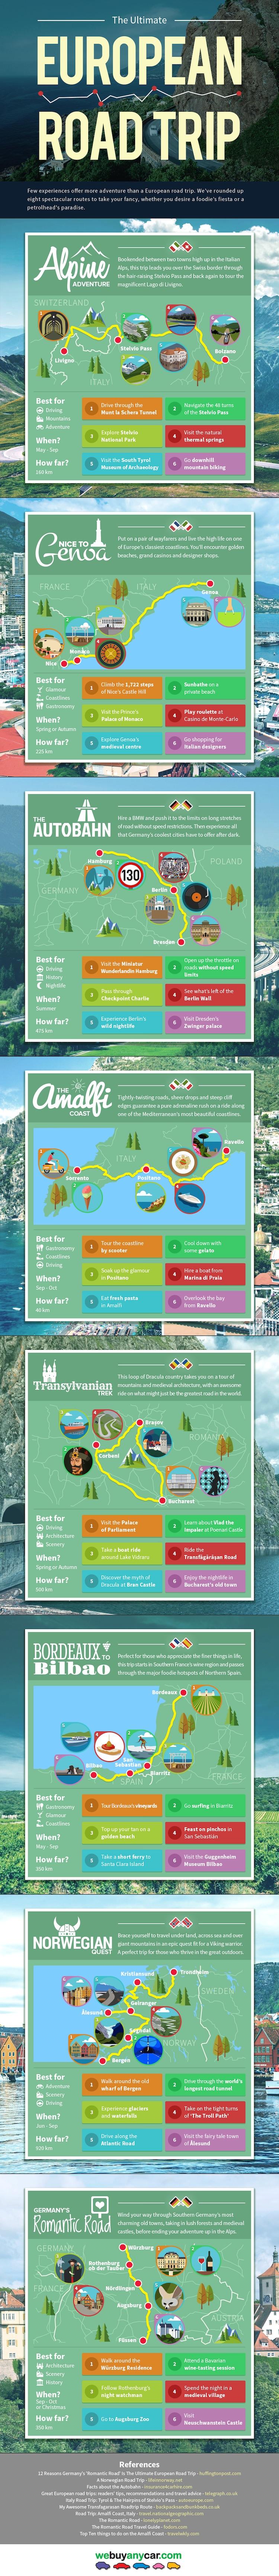 ultimate-european-road-trip